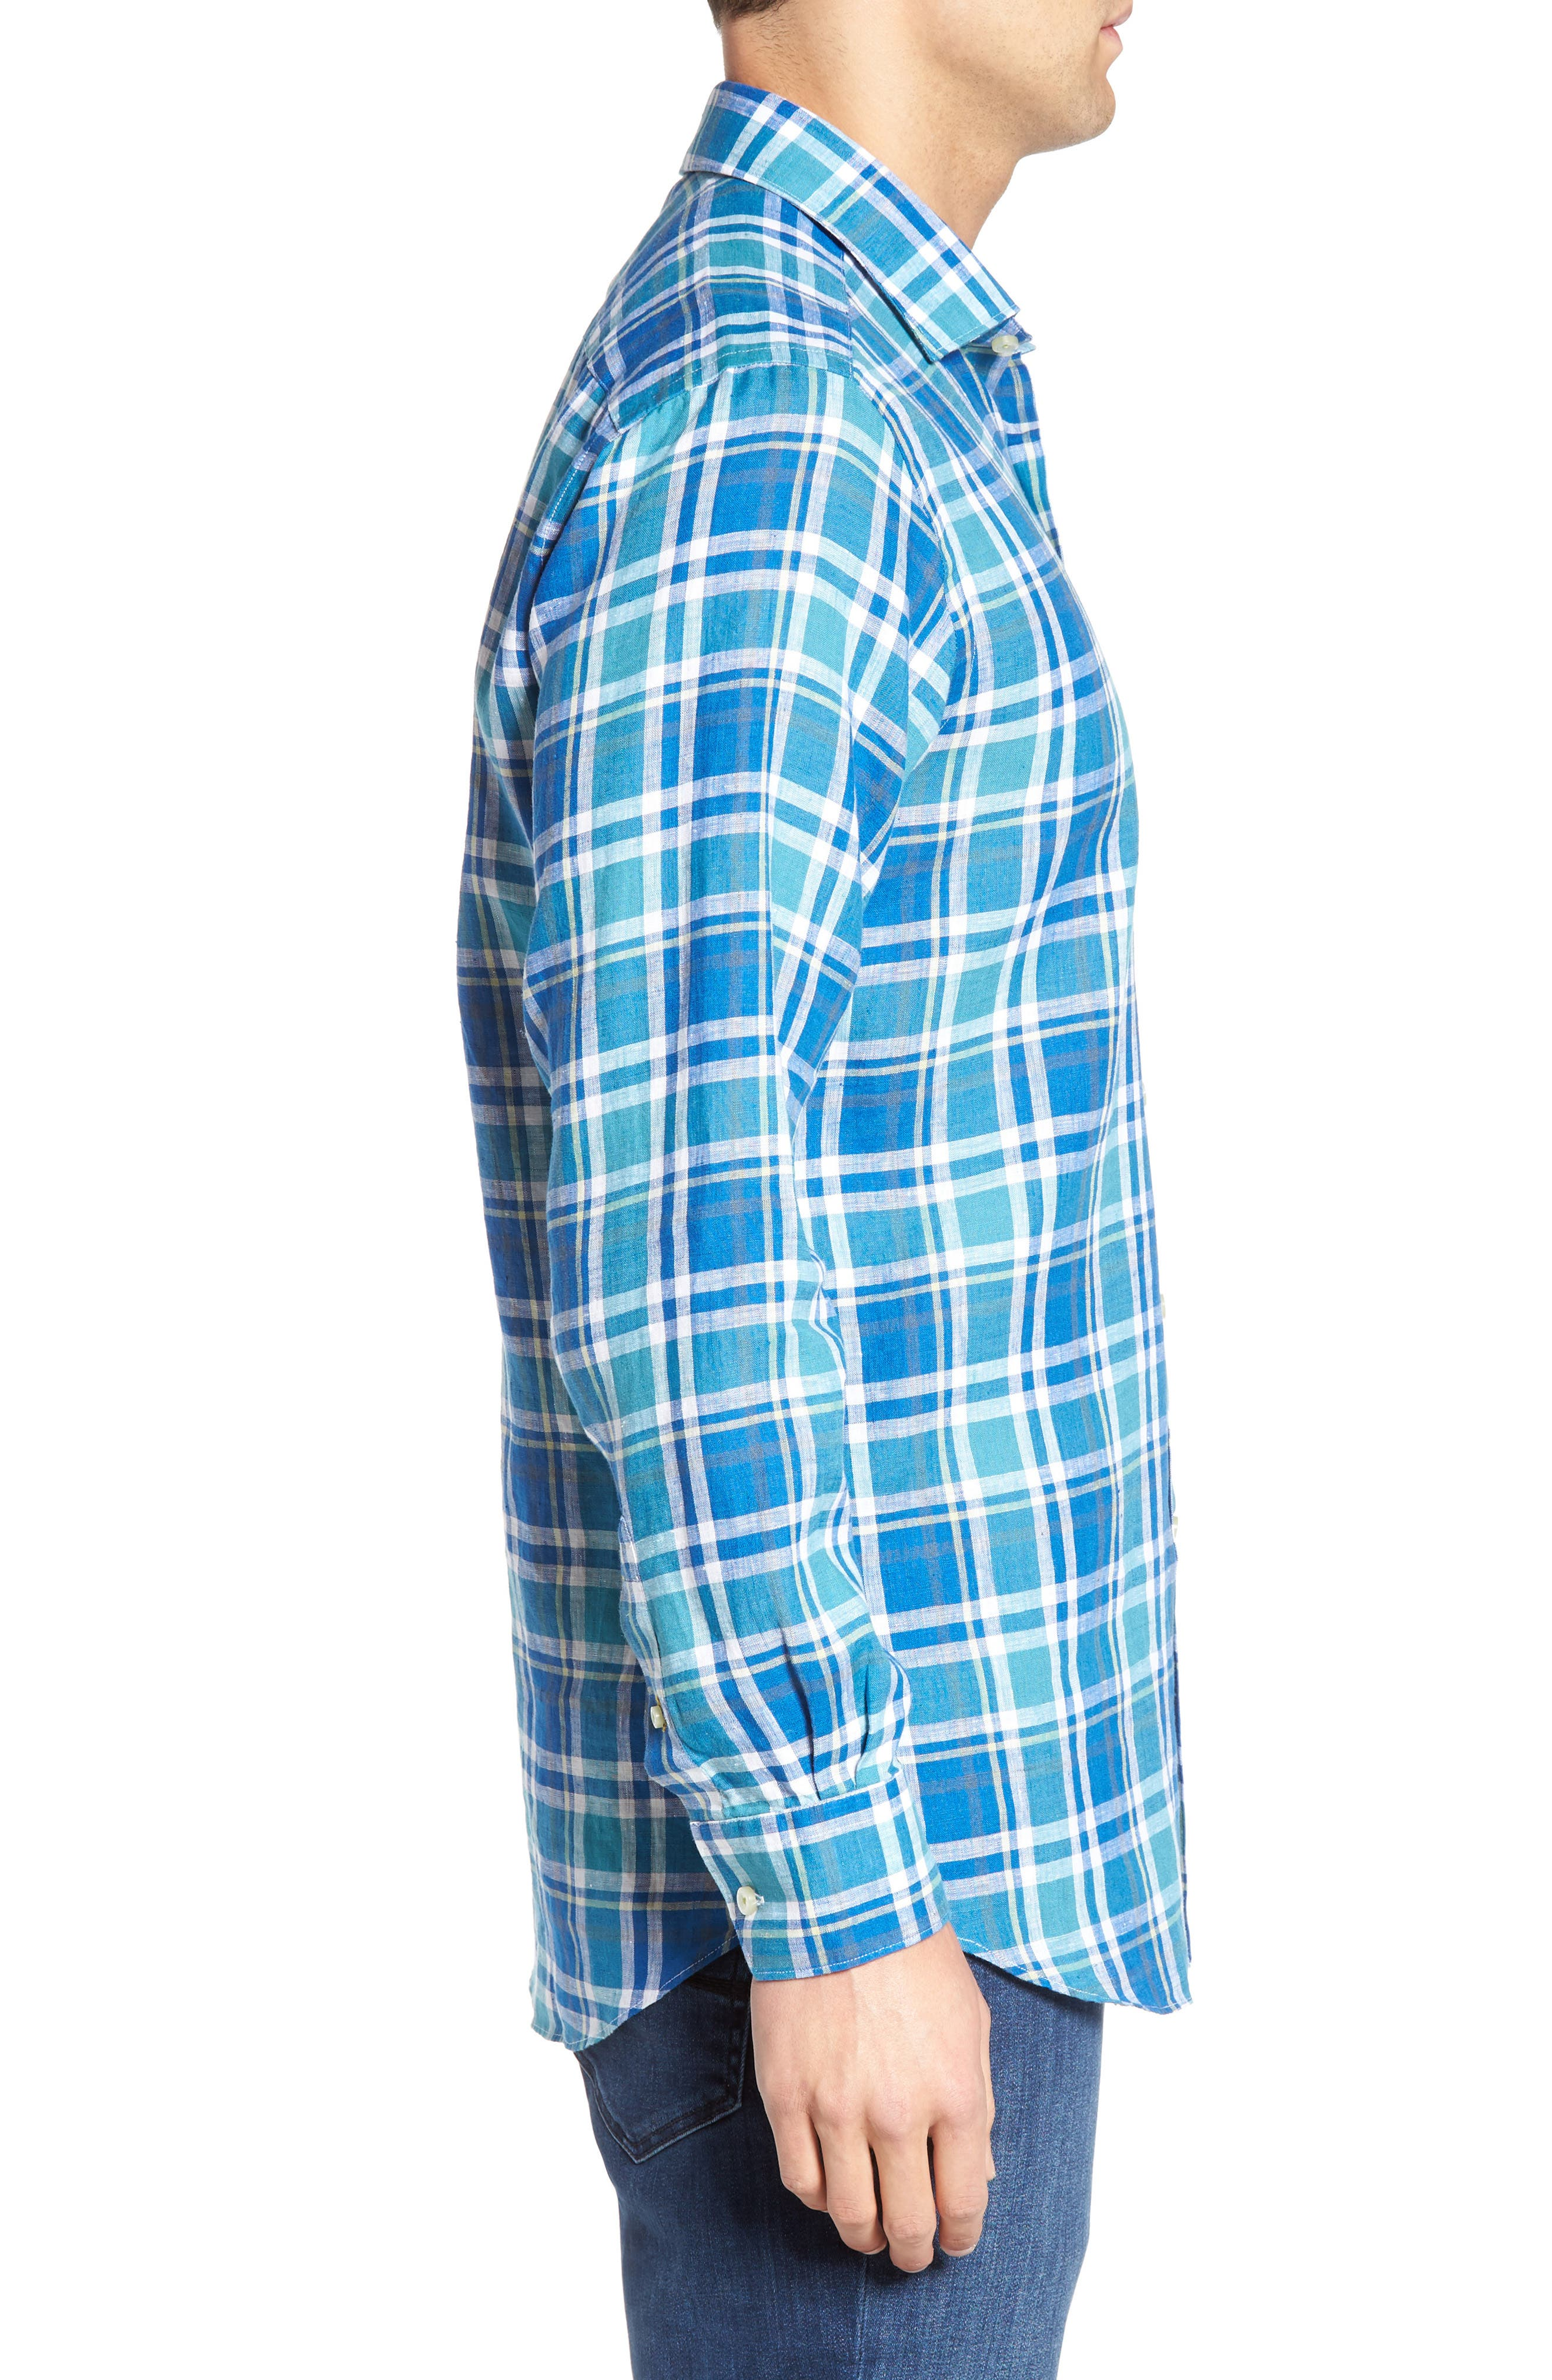 Crespi IV Tailored Fit Sport Shirt,                             Alternate thumbnail 4, color,                             Teal